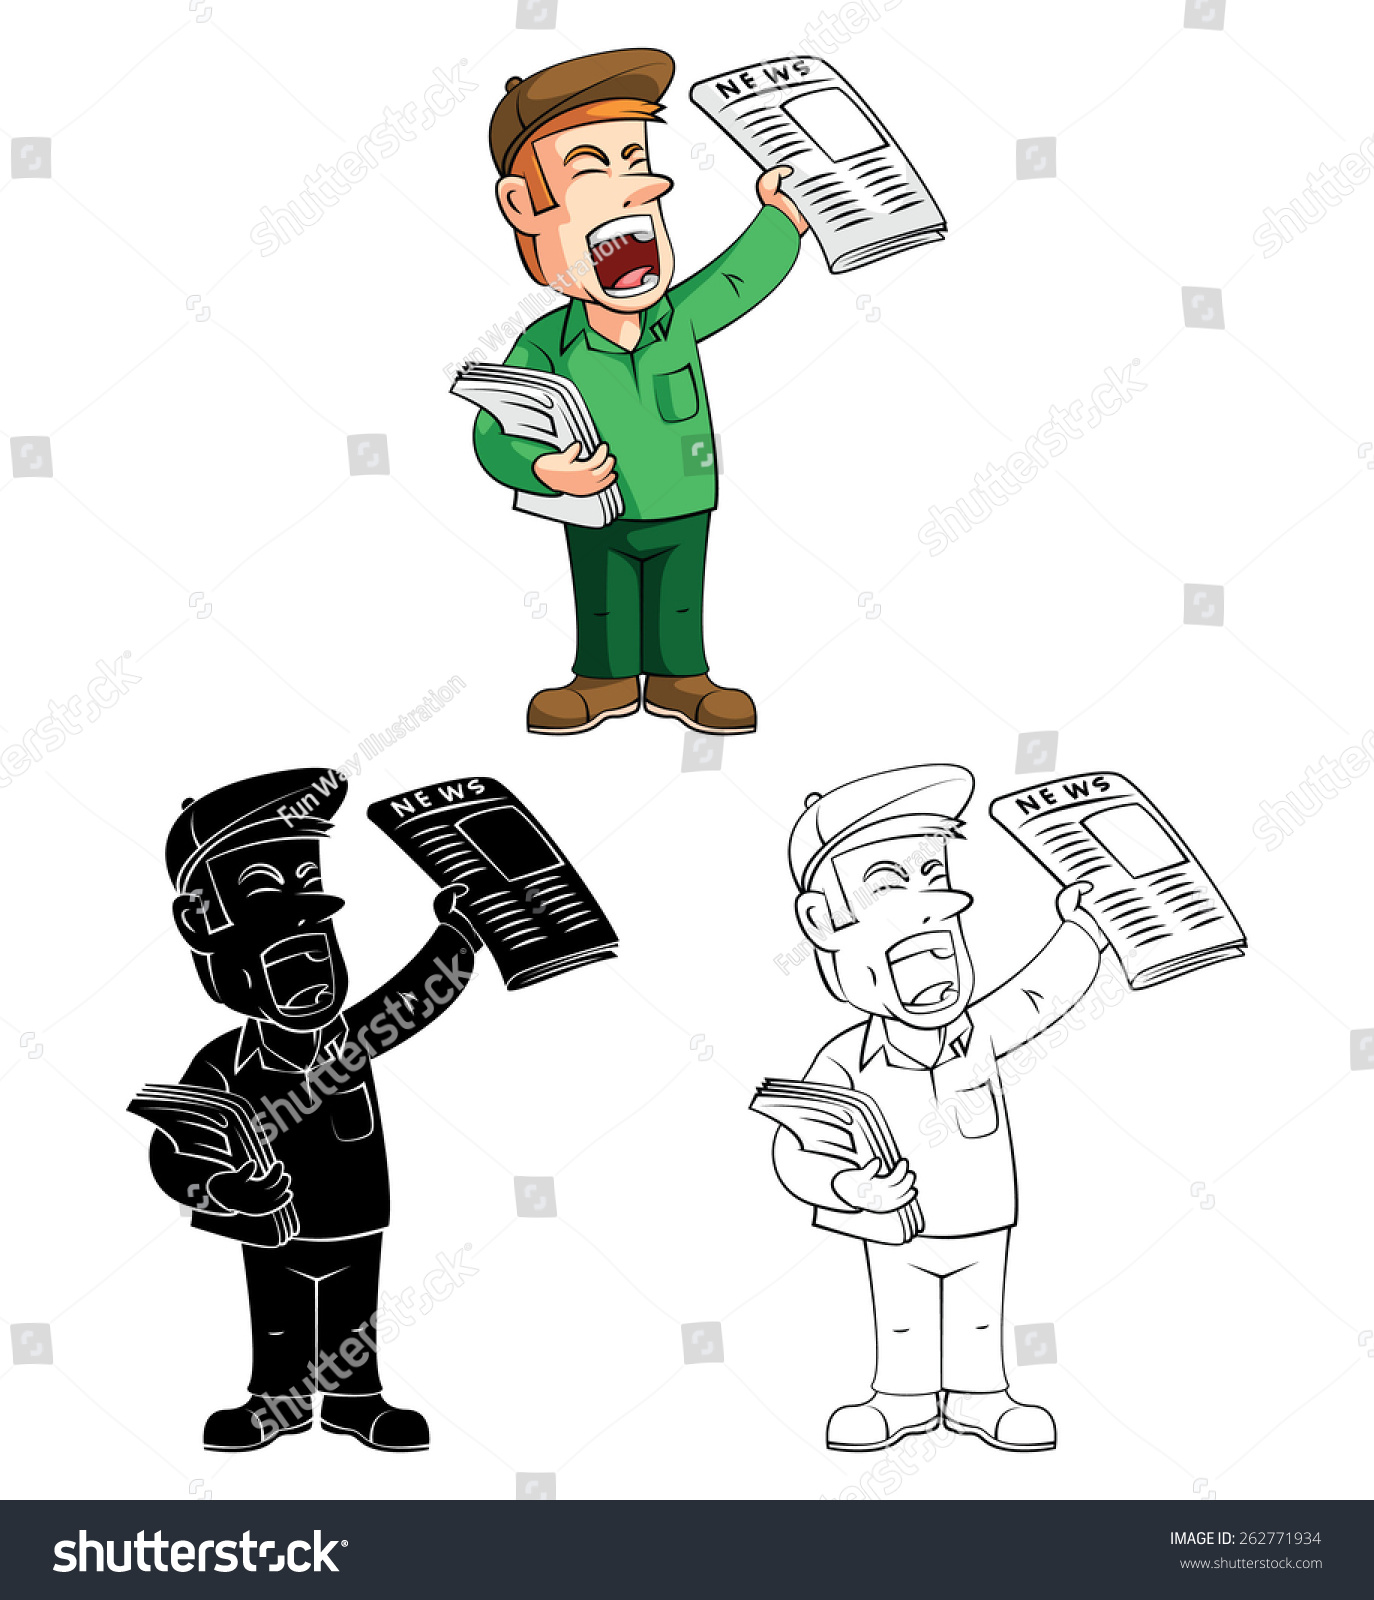 coloring book paper boy cartoon character - Coloring Book Paper Stock